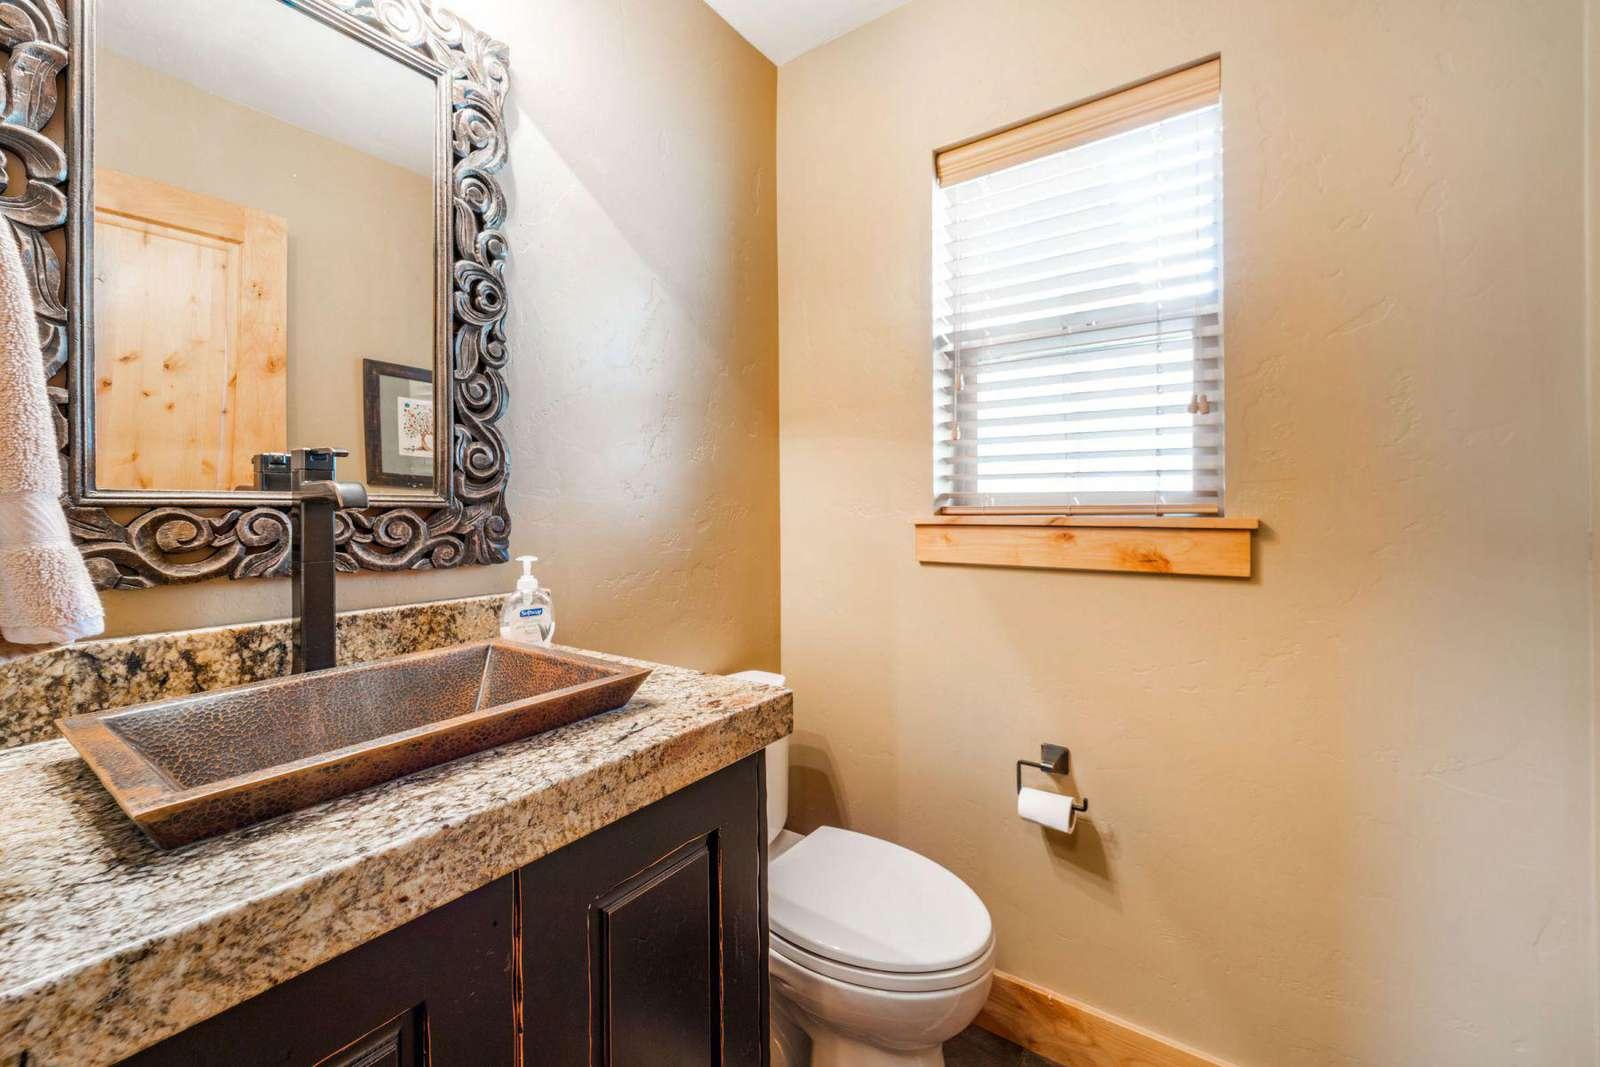 Half bathroom with window